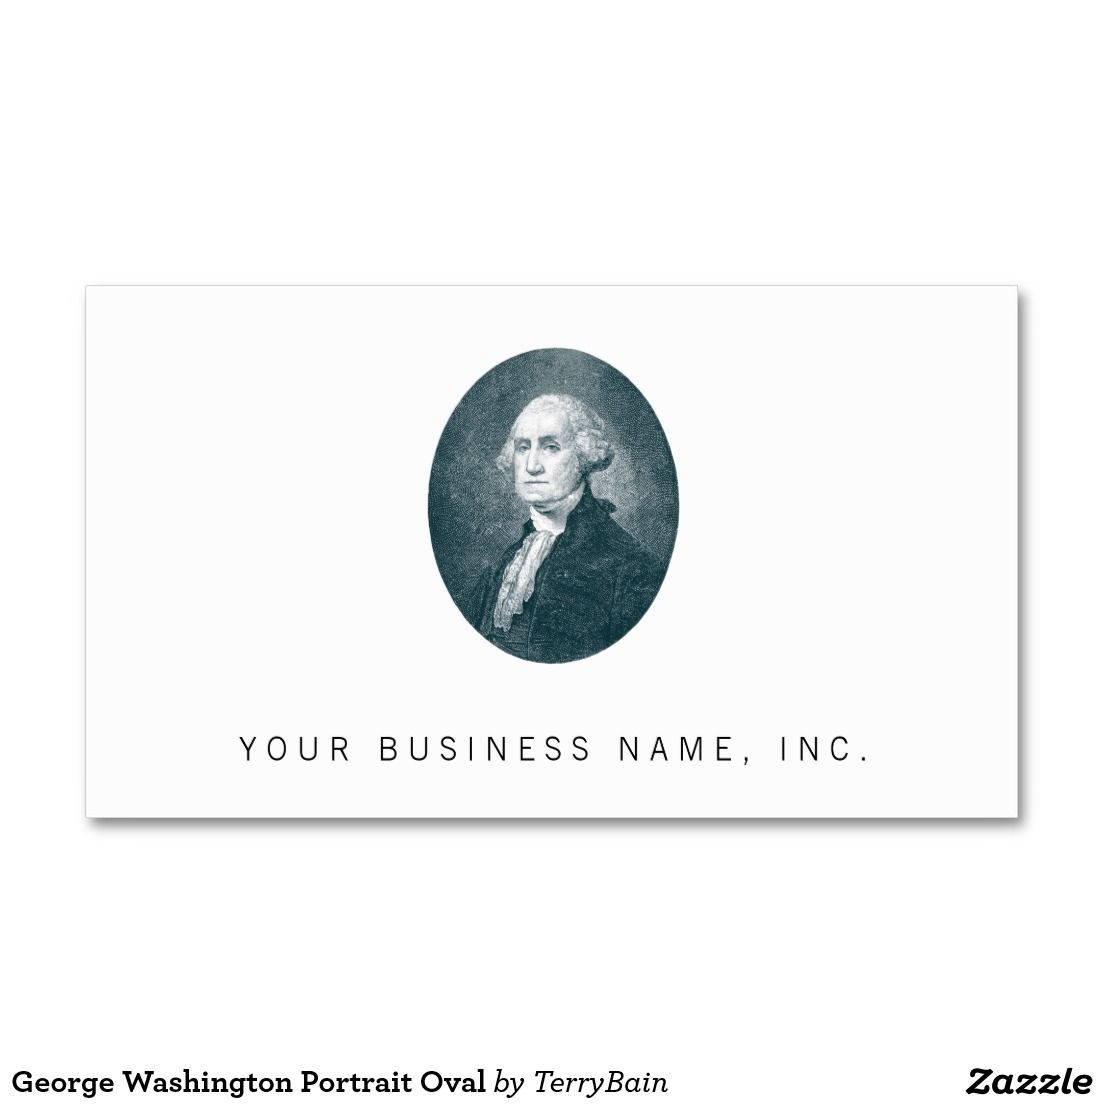 George Washington Portrait Oval Business Card Stuff Sold On Zazzle